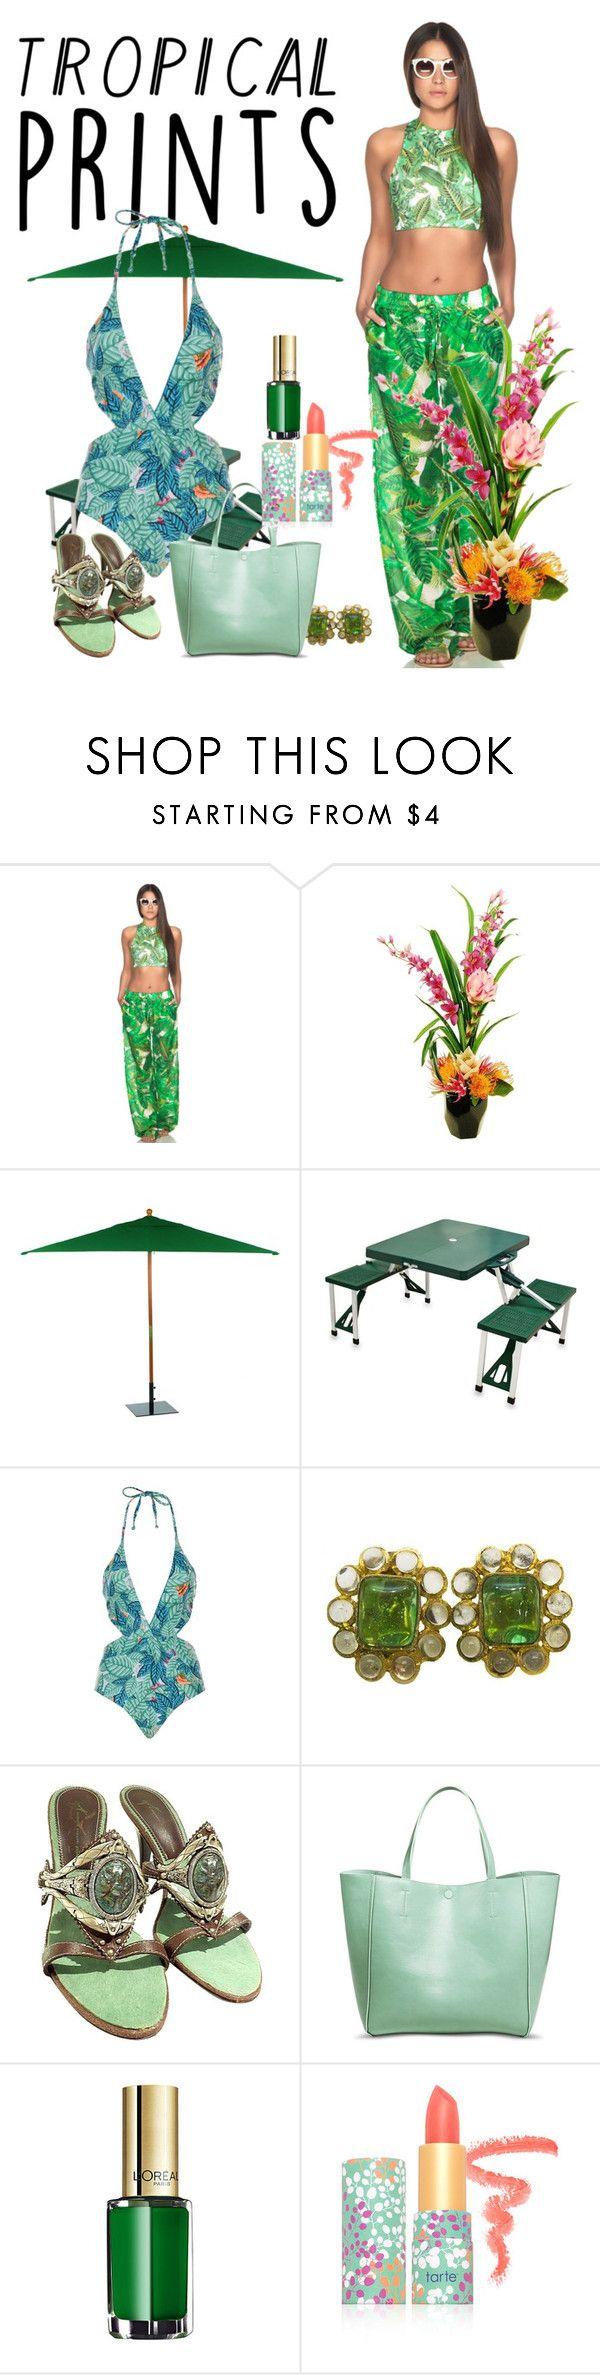 """Tropic"" by ann-kelley14 on Polyvore featuring Estivo, Designs by Lauren, Oxford Garden, Picnic Time, Mara Hoffman, Chanel, Giuseppe Zanotti, Merona, L'Oréal Paris and tarte"